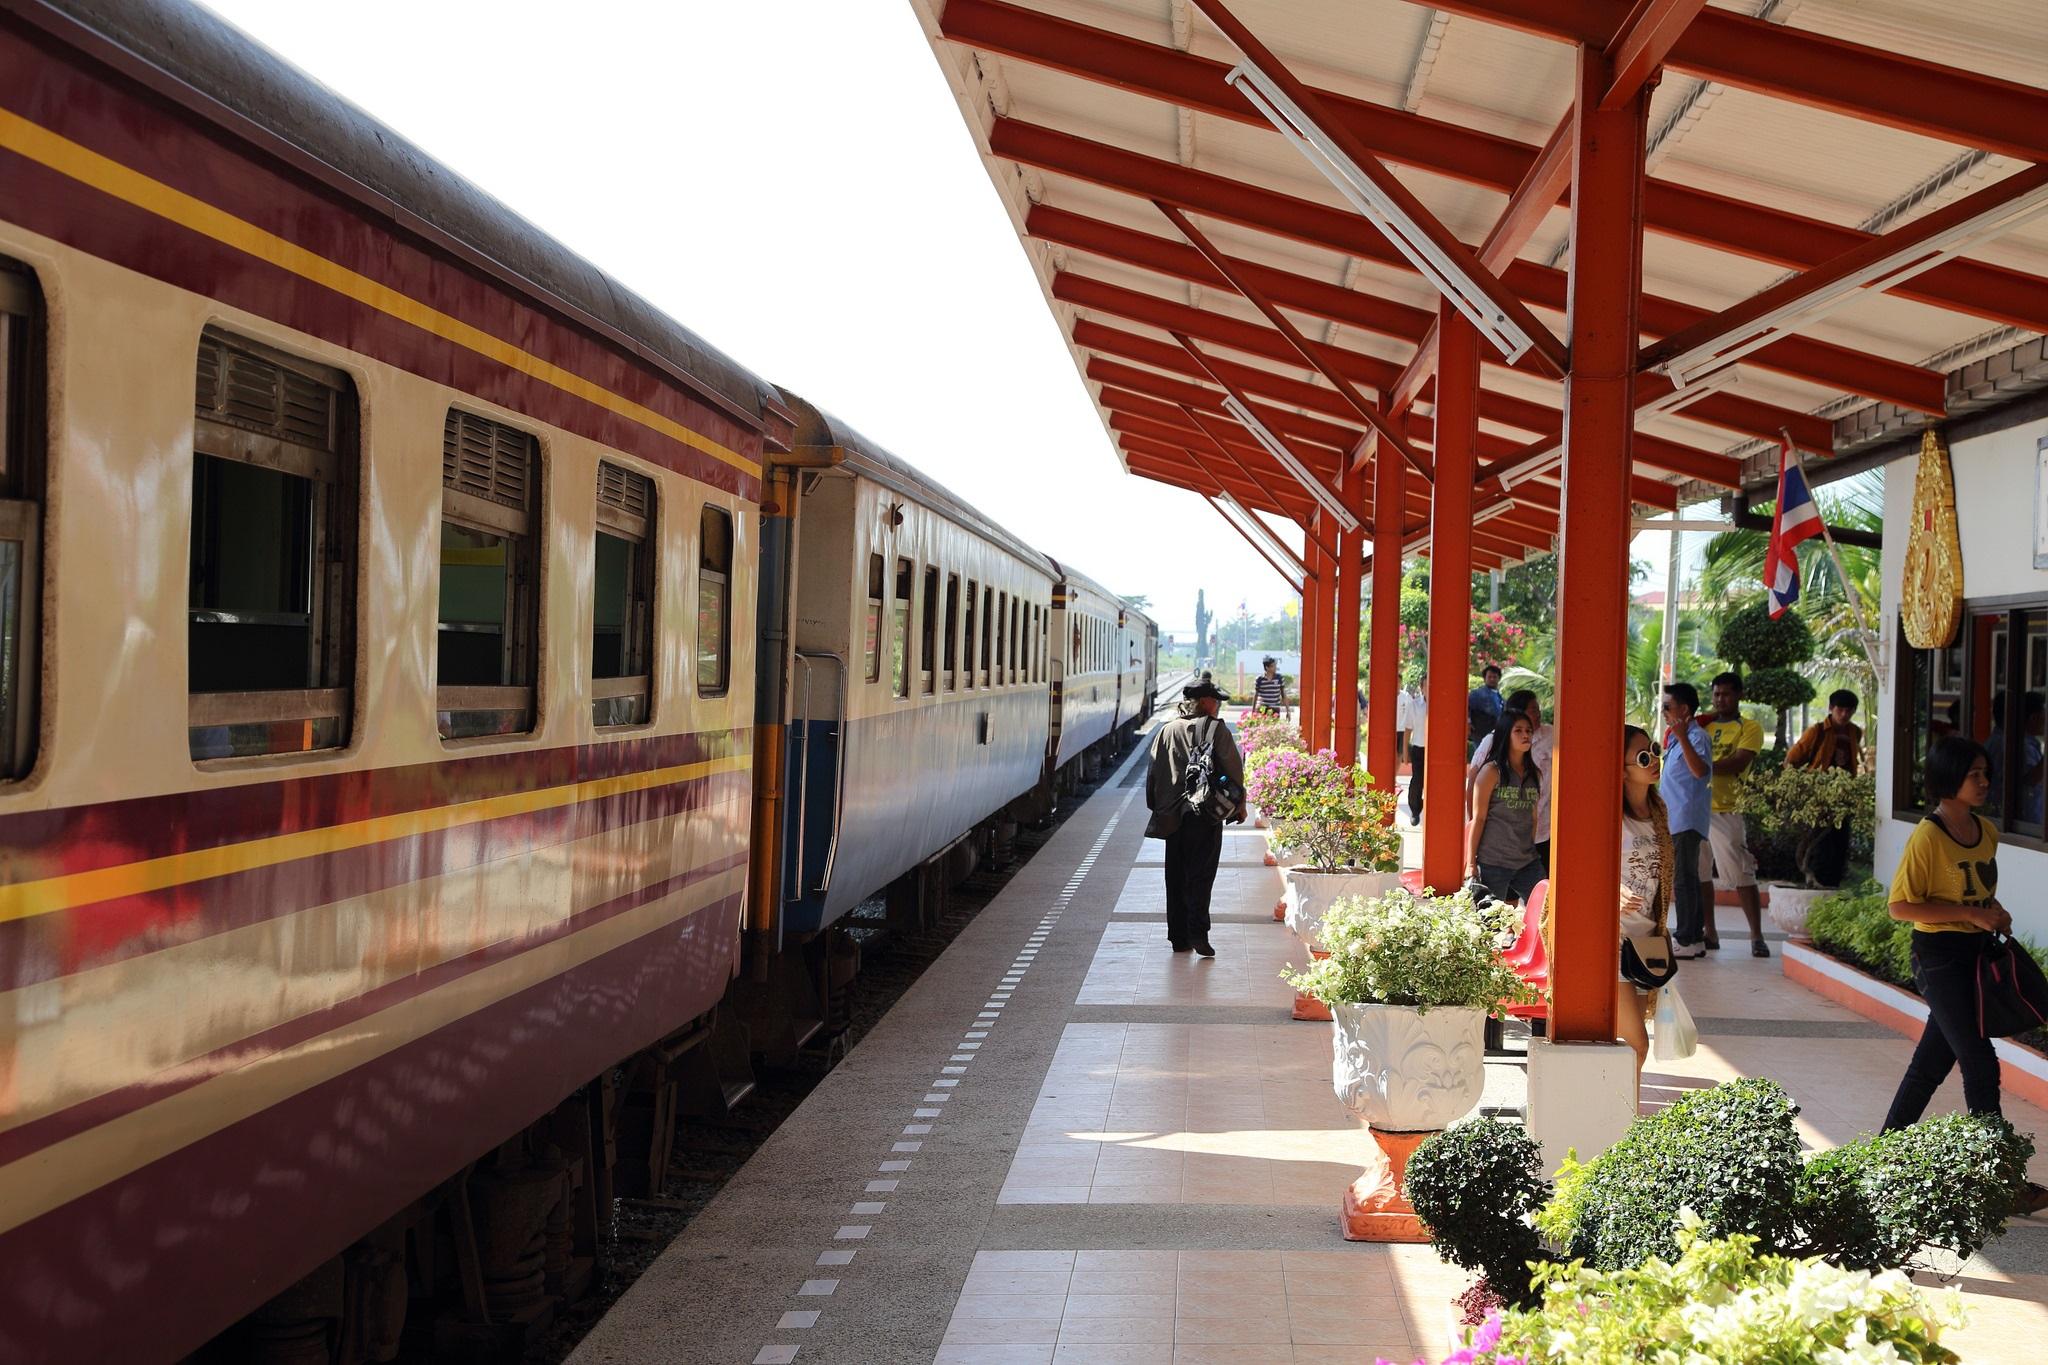 Travelling from Bangkok to Pattaya by train